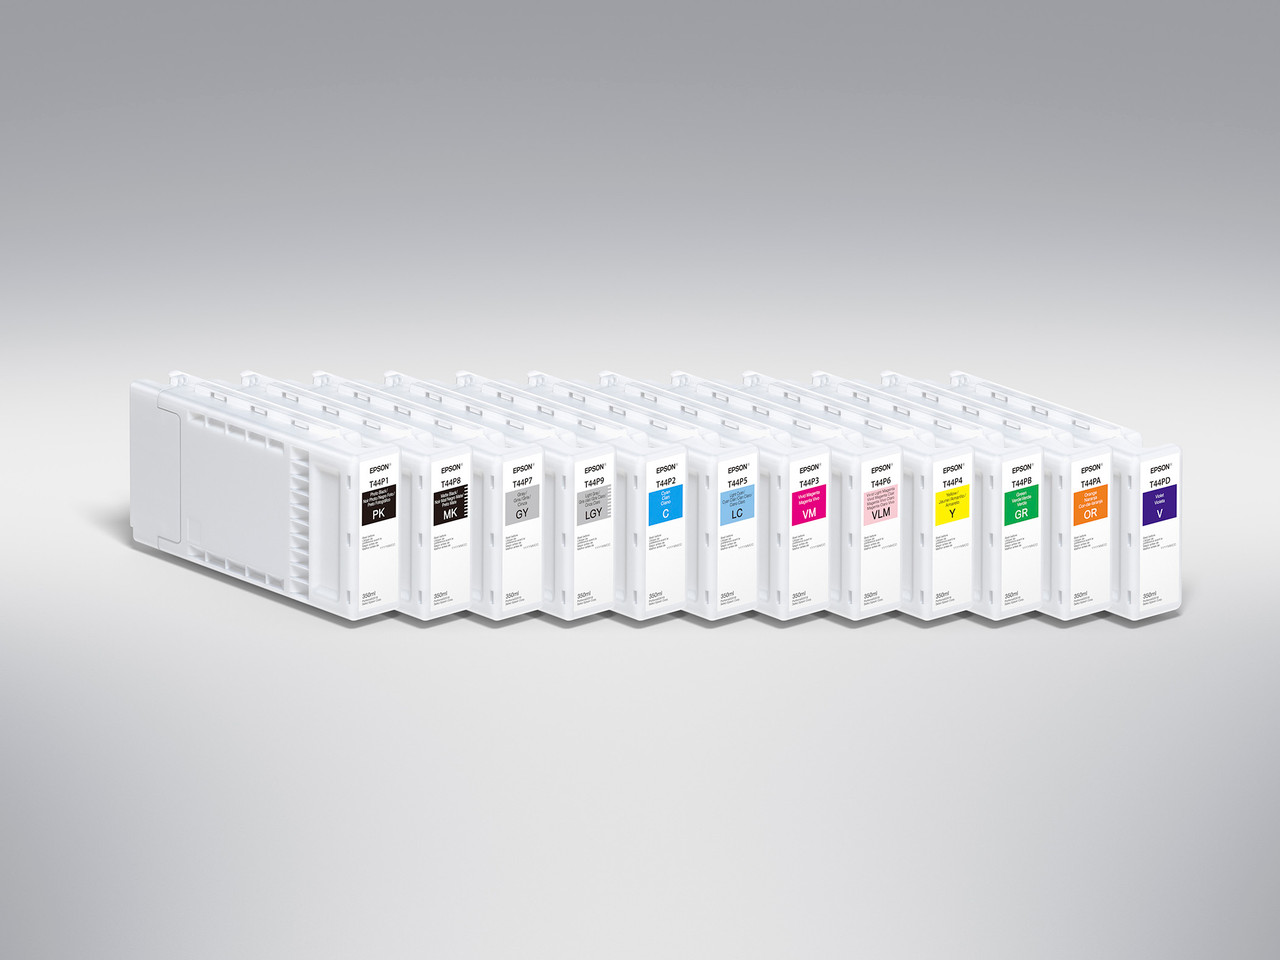 Epson T44H220 Cyan Ink Cartridge, 700 mL